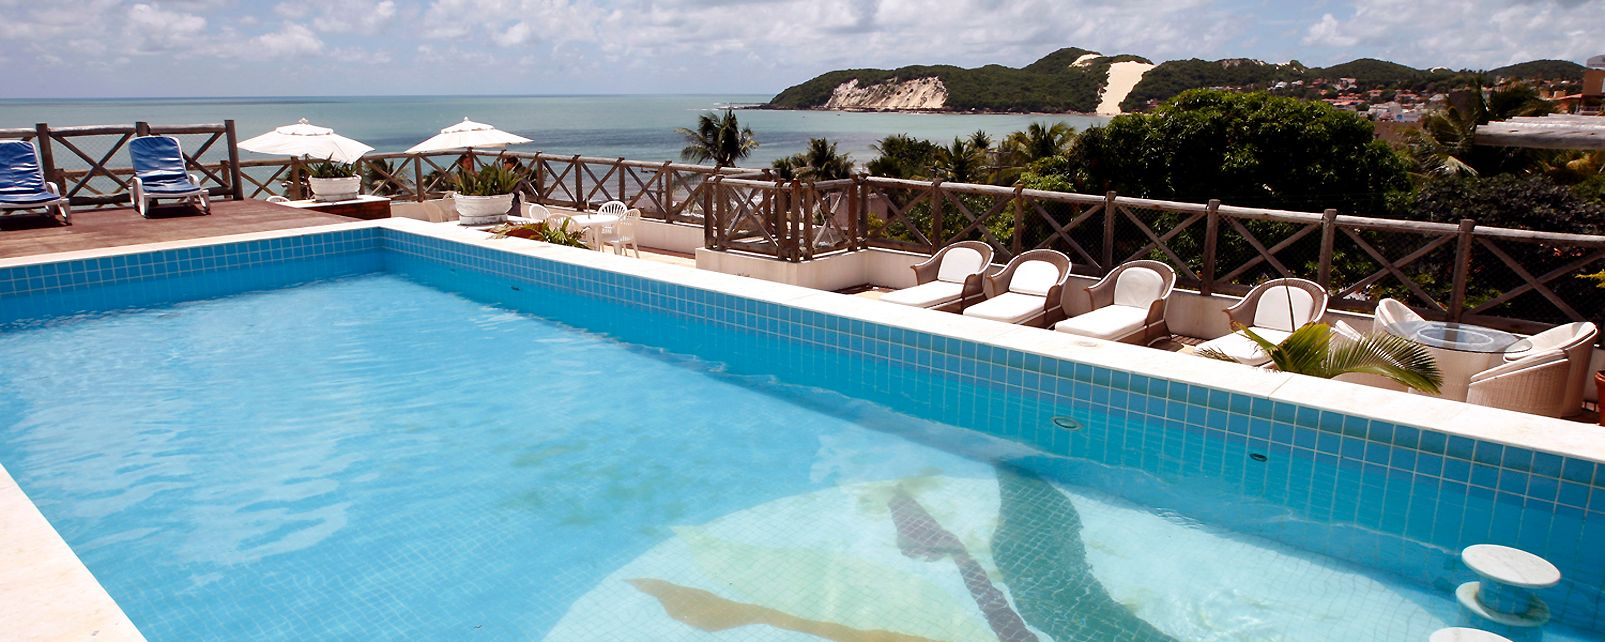 Hotel Maritima Flat